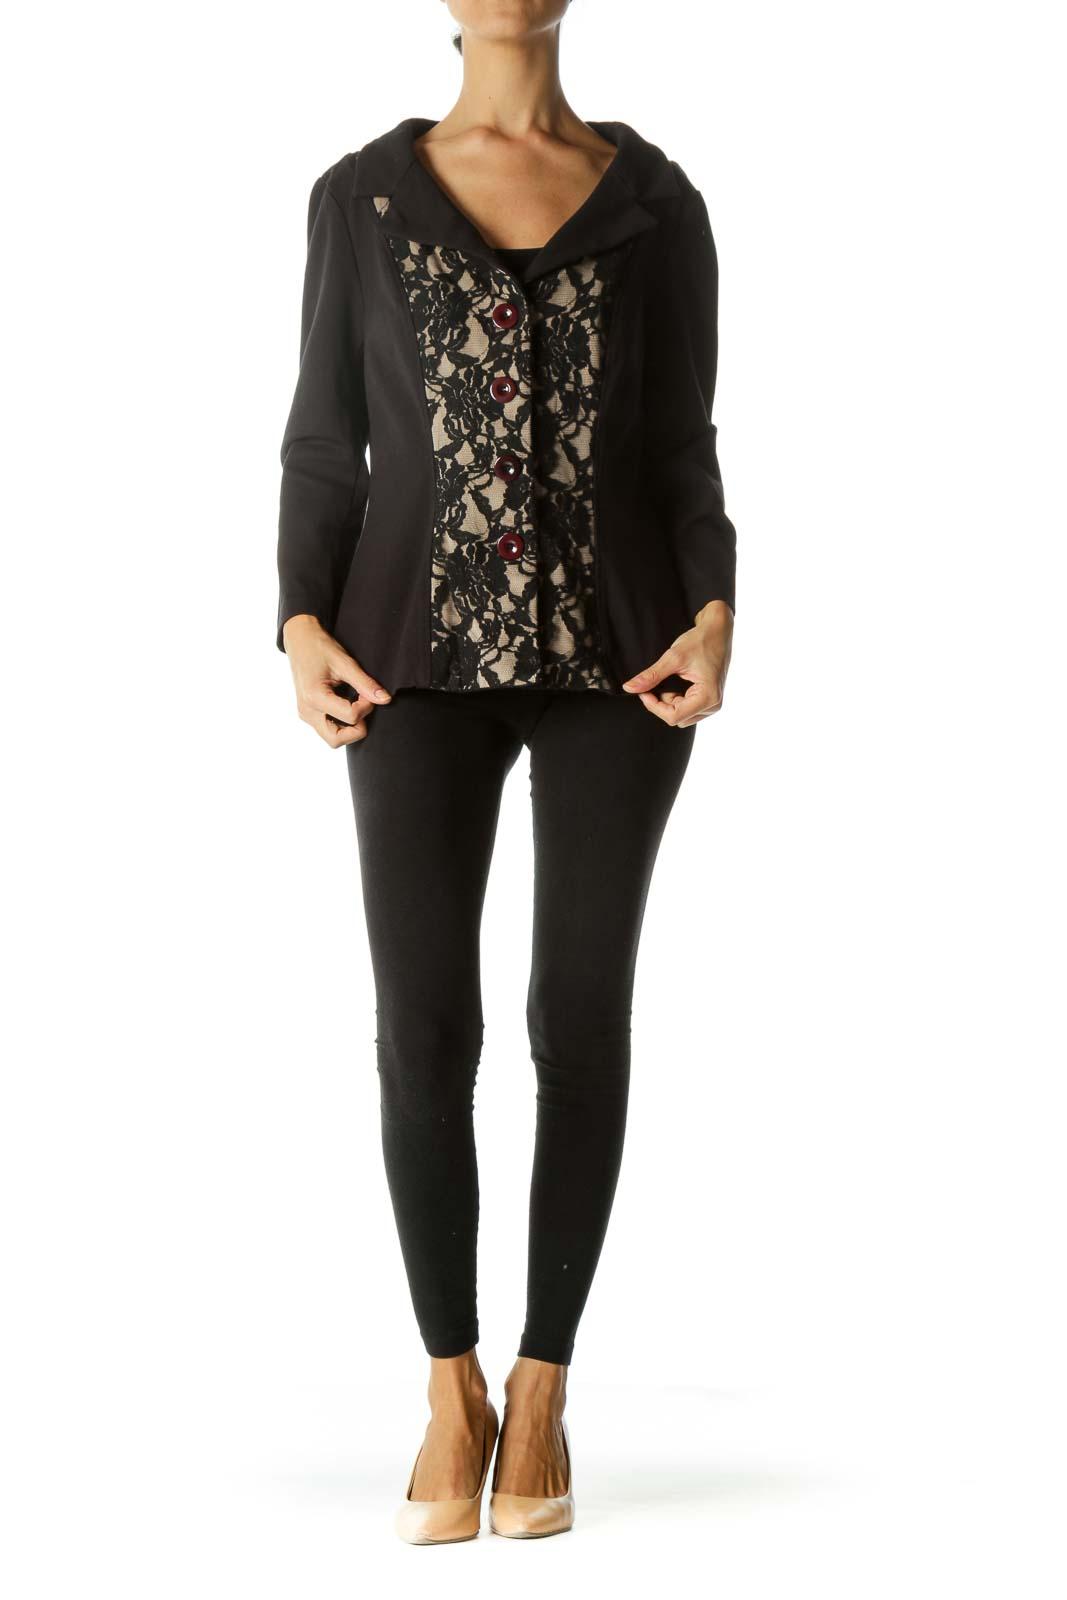 Black Beige Floral Lace Burgundy Buttons Mixed Media Soft Blazer